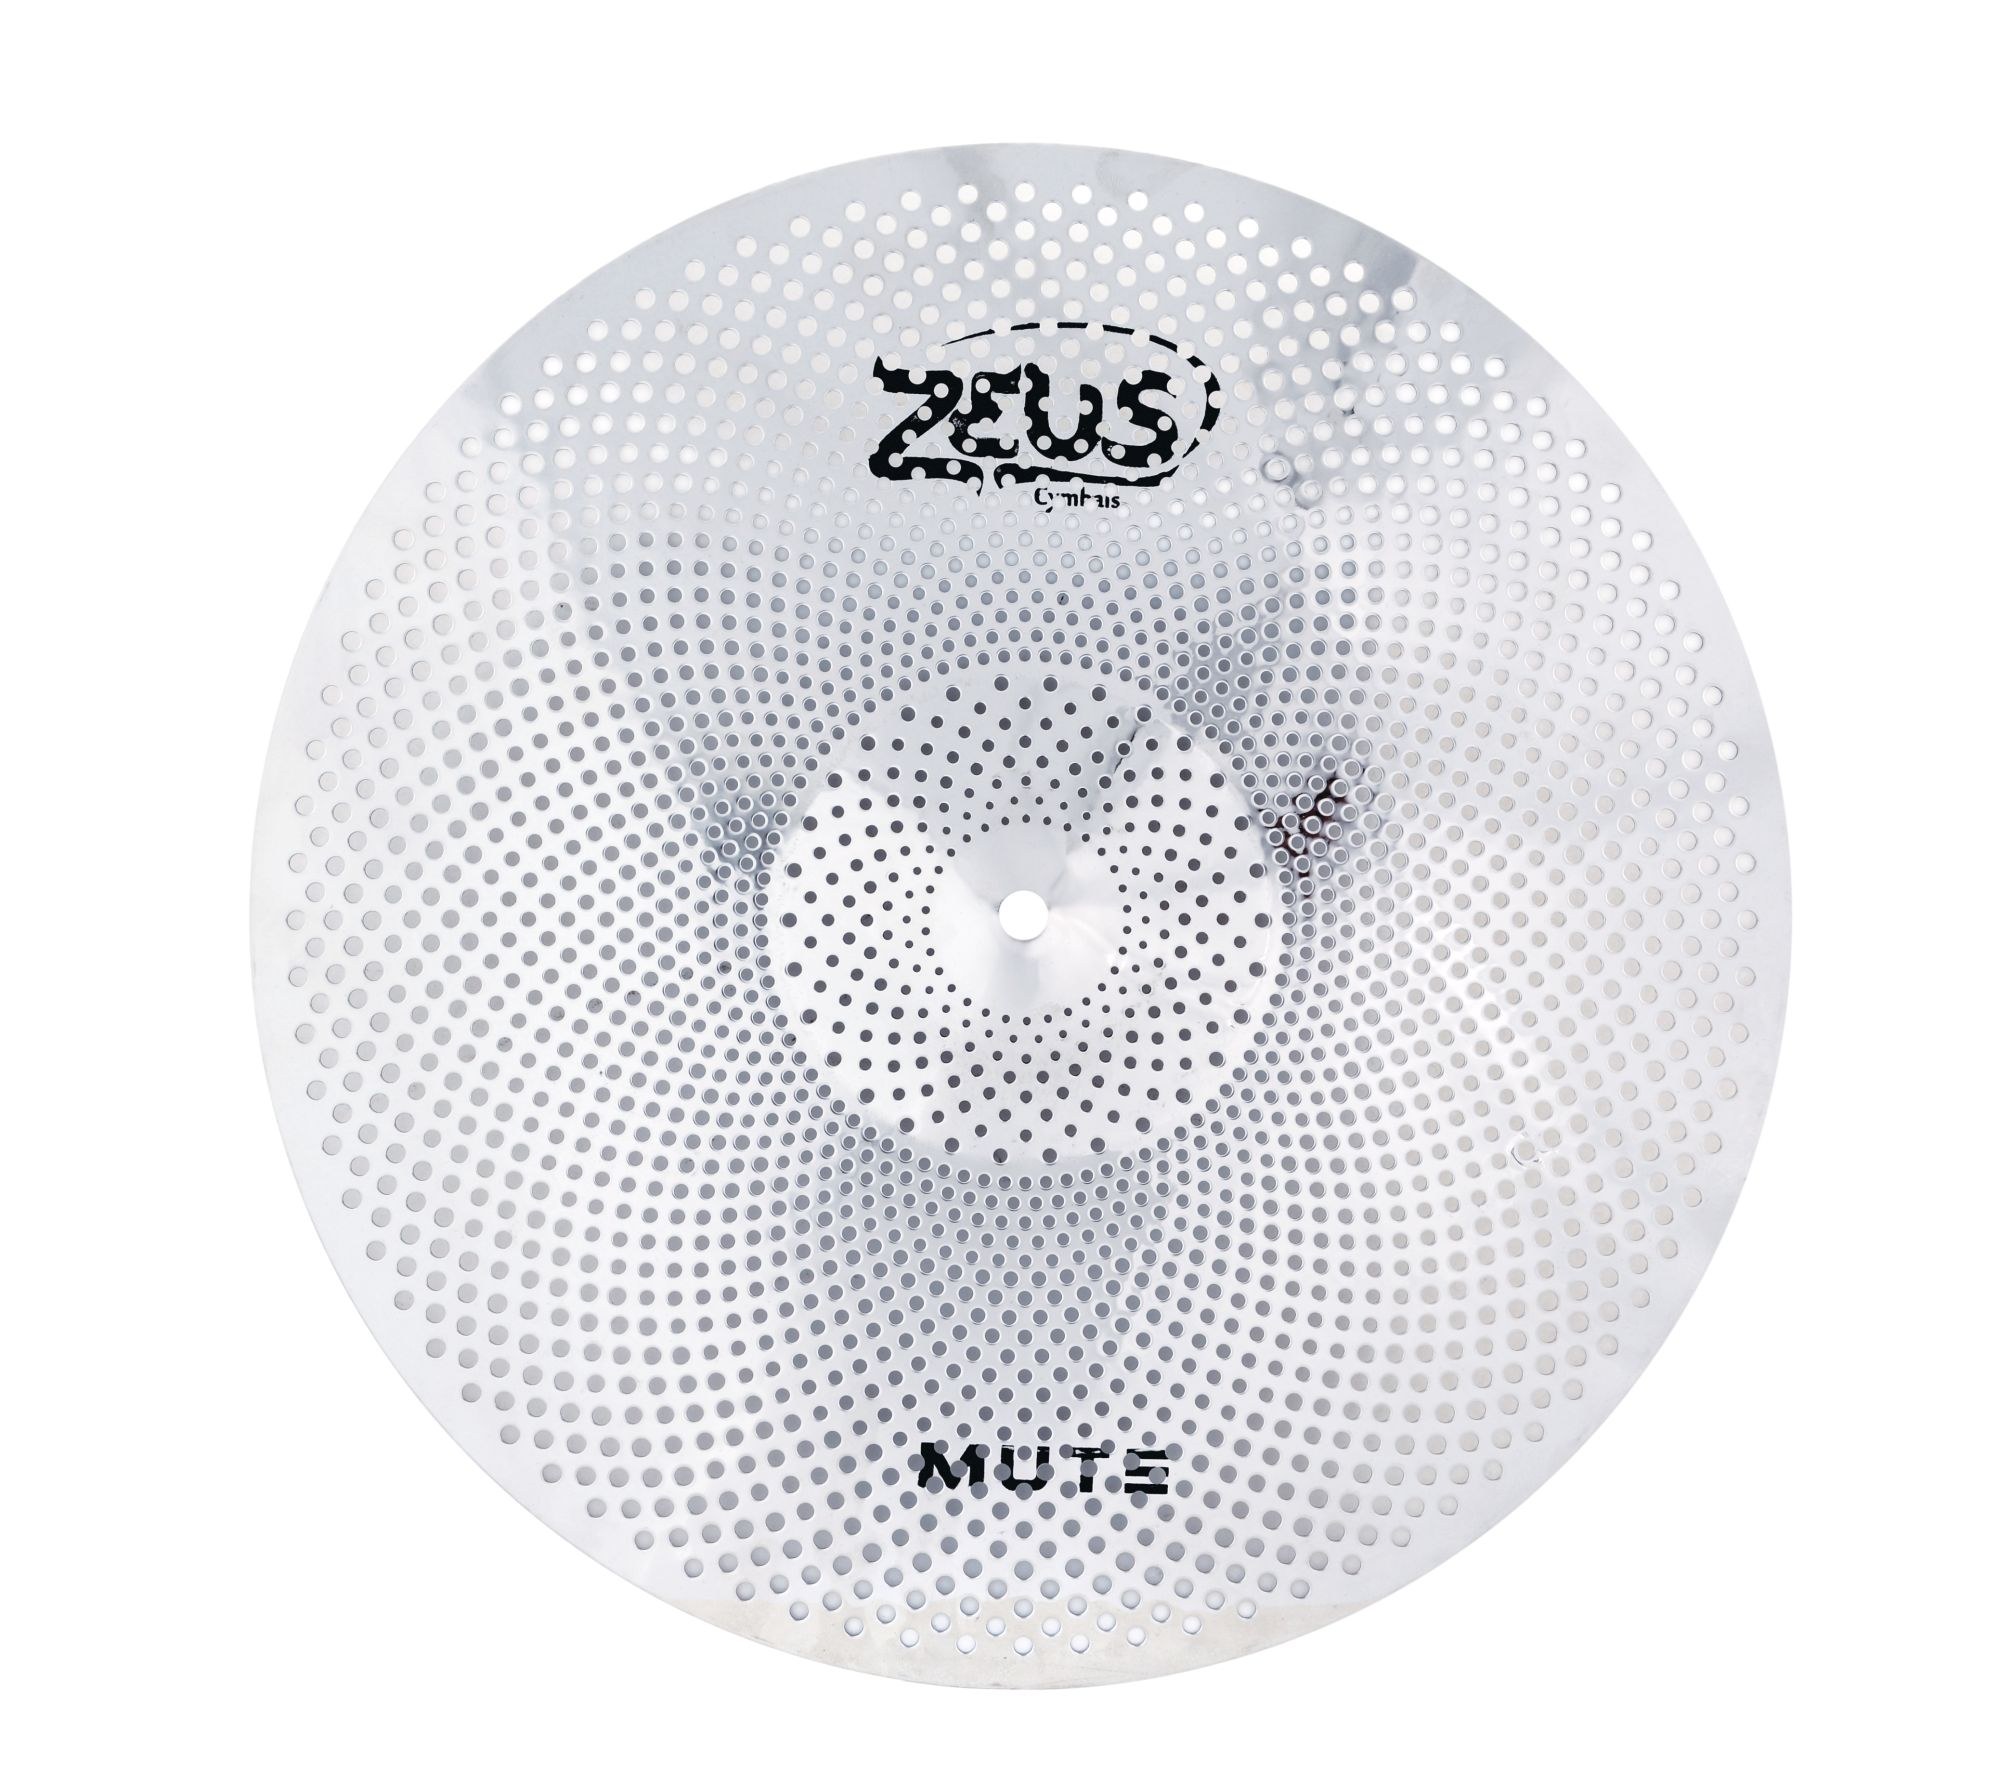 Prato Zeus Mute Crash 18 Zmc18